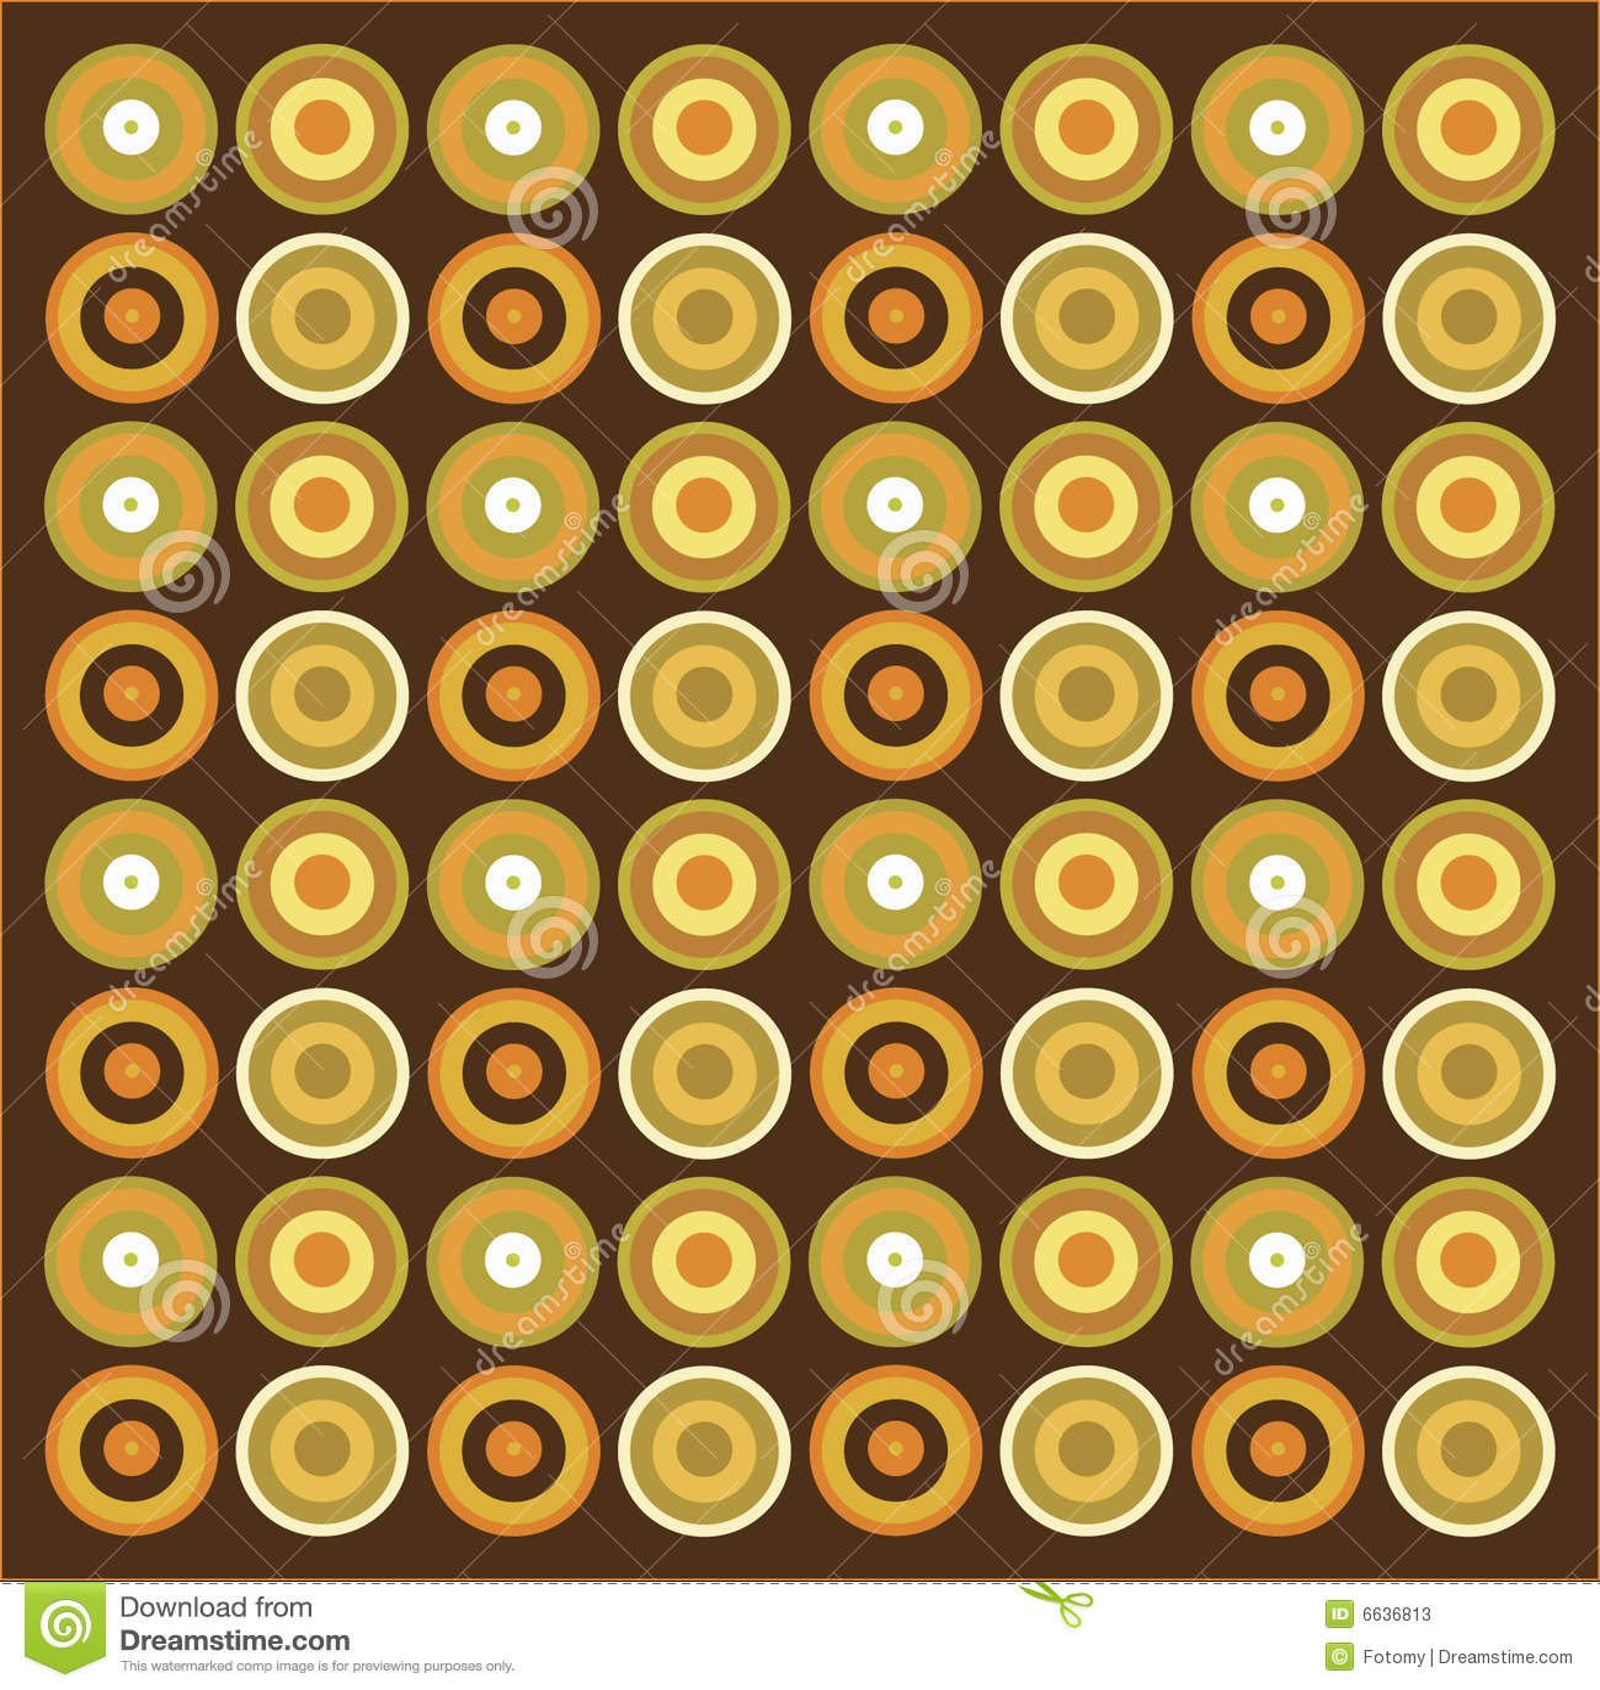 Retro Wallpaper Pattern Royalty Free Illustration